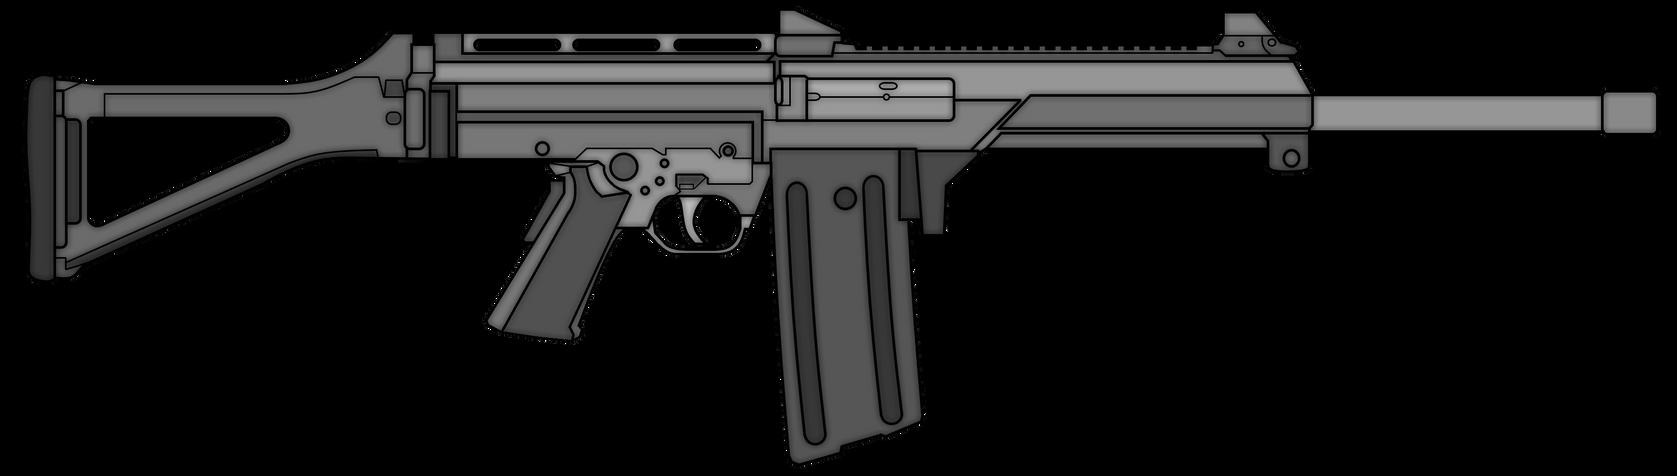 LW3 Automatic Shotgun by TheFrozenWaffle